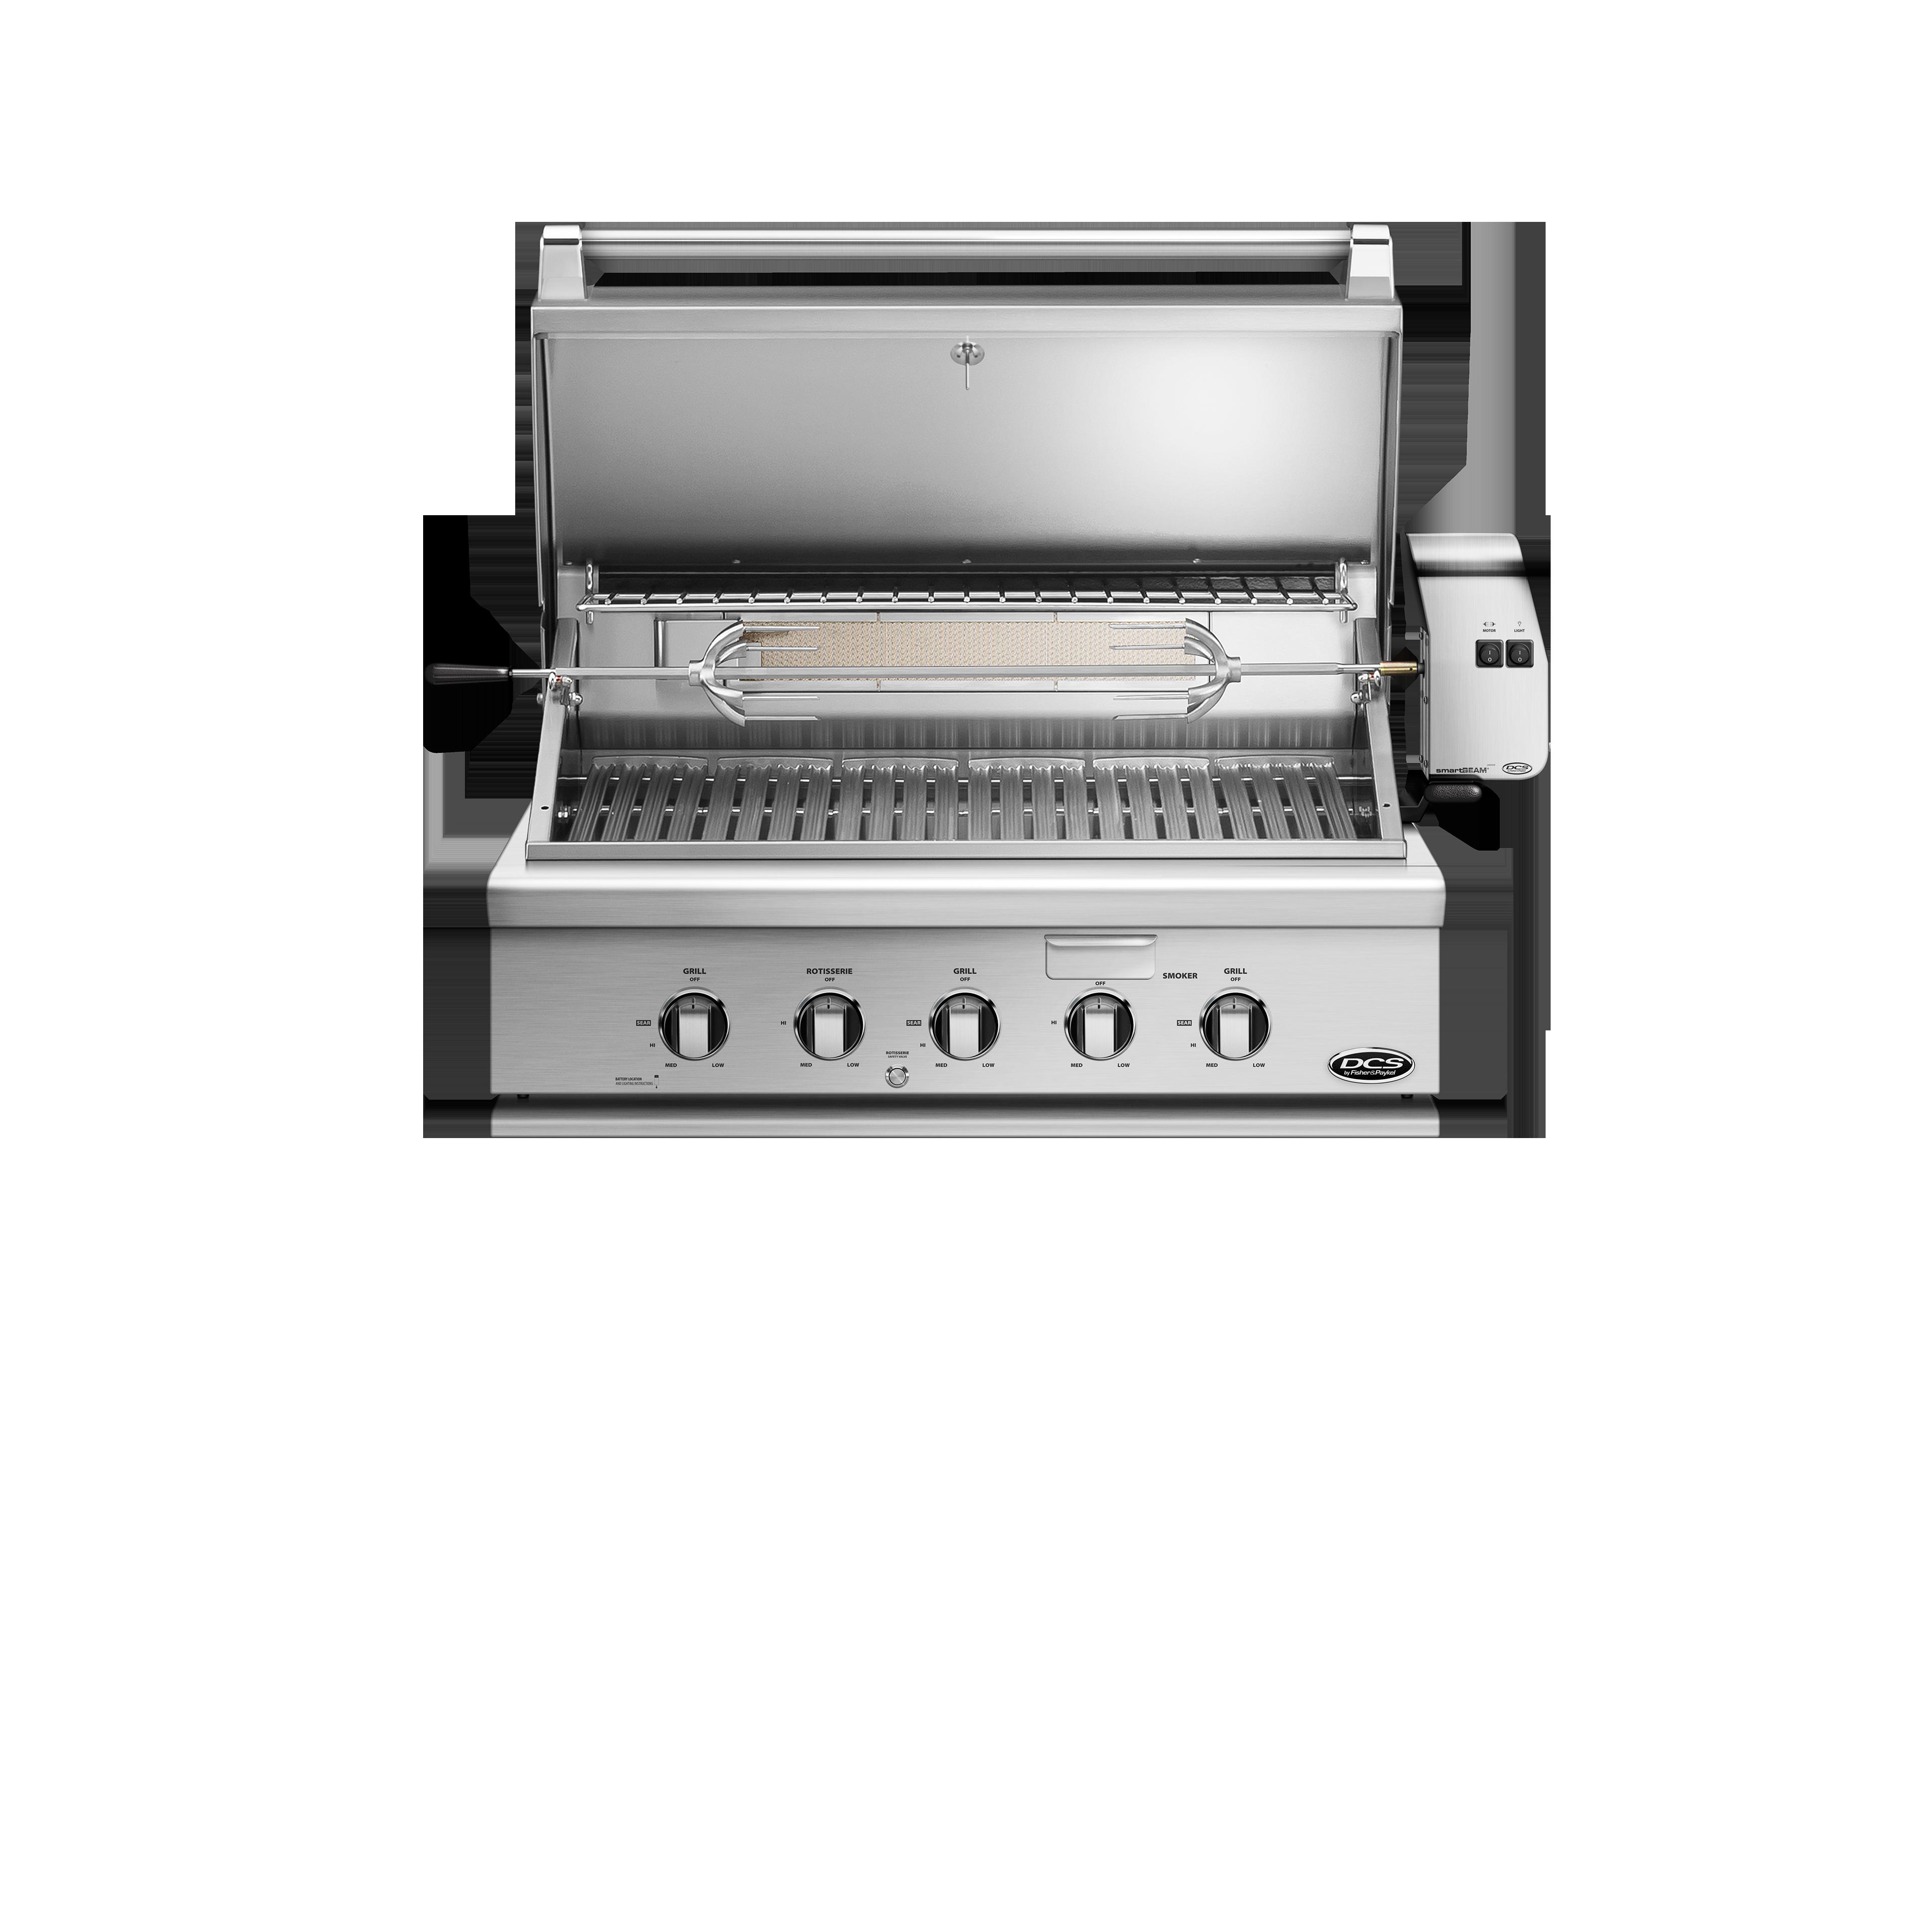 "Model: BH1-36R-N | DCS 36"" Series 7 Grill, Natural Gas"